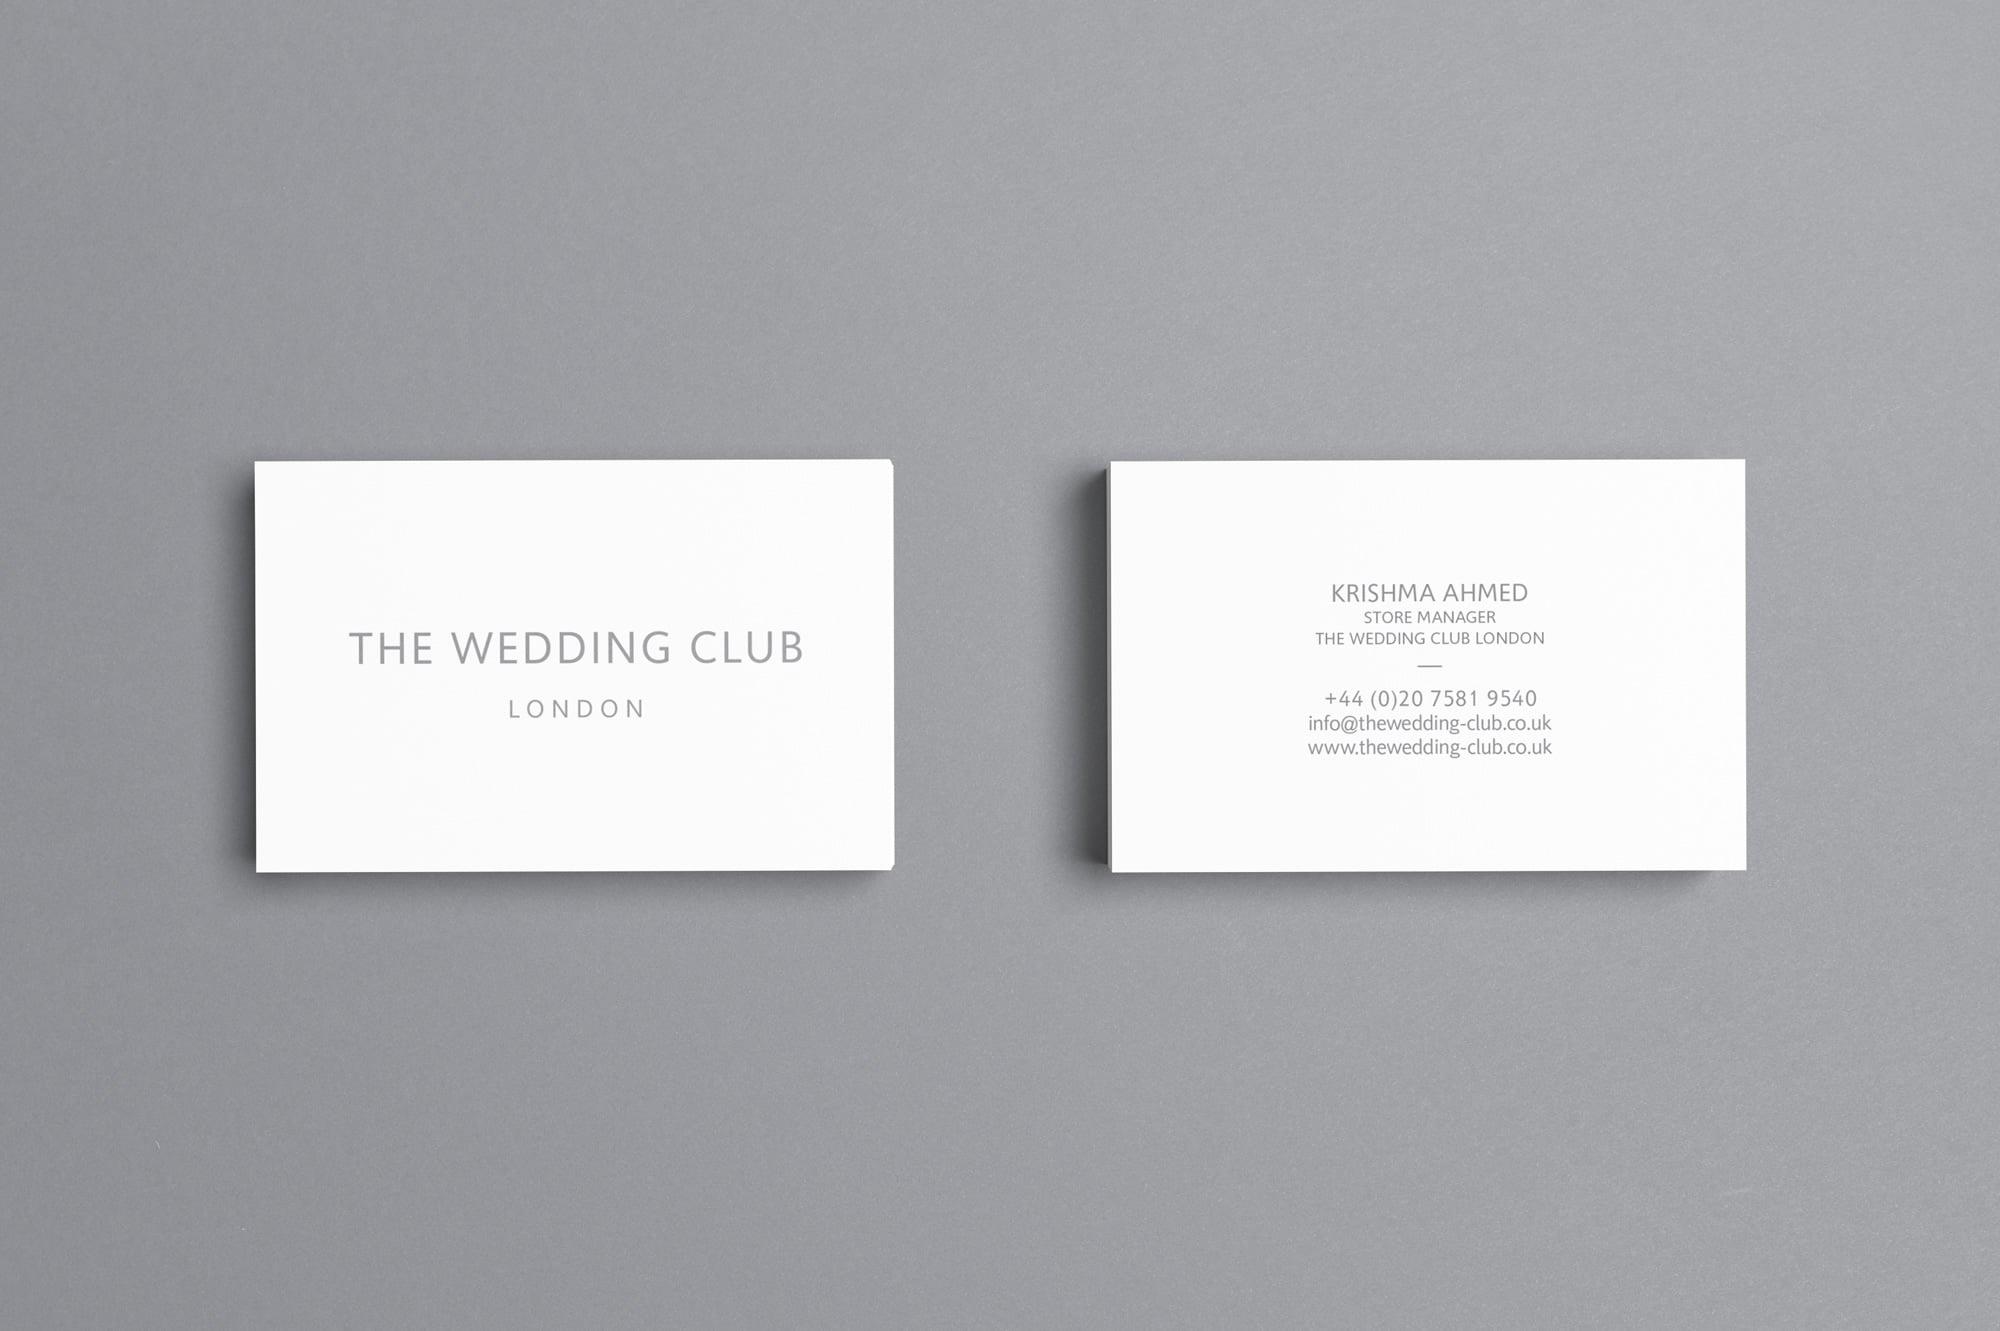 The Wedding Club Business Card